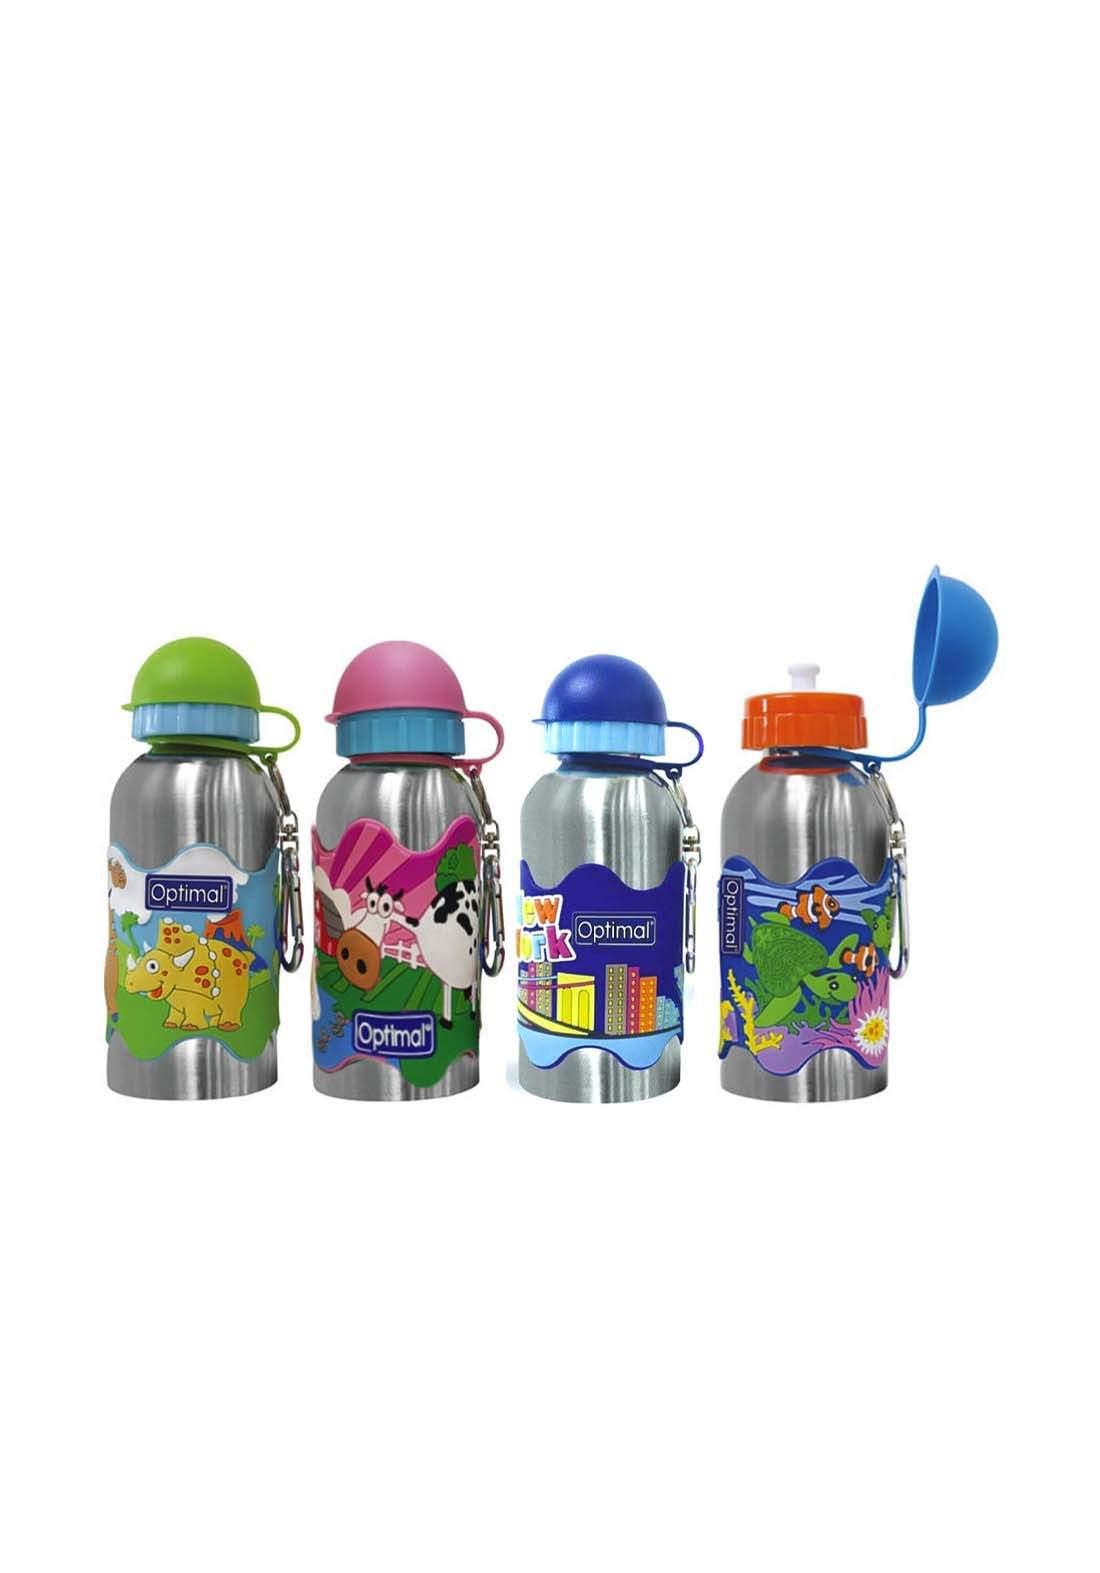 Optimal Stainless steel water bottel 350ml مطارة أطفال